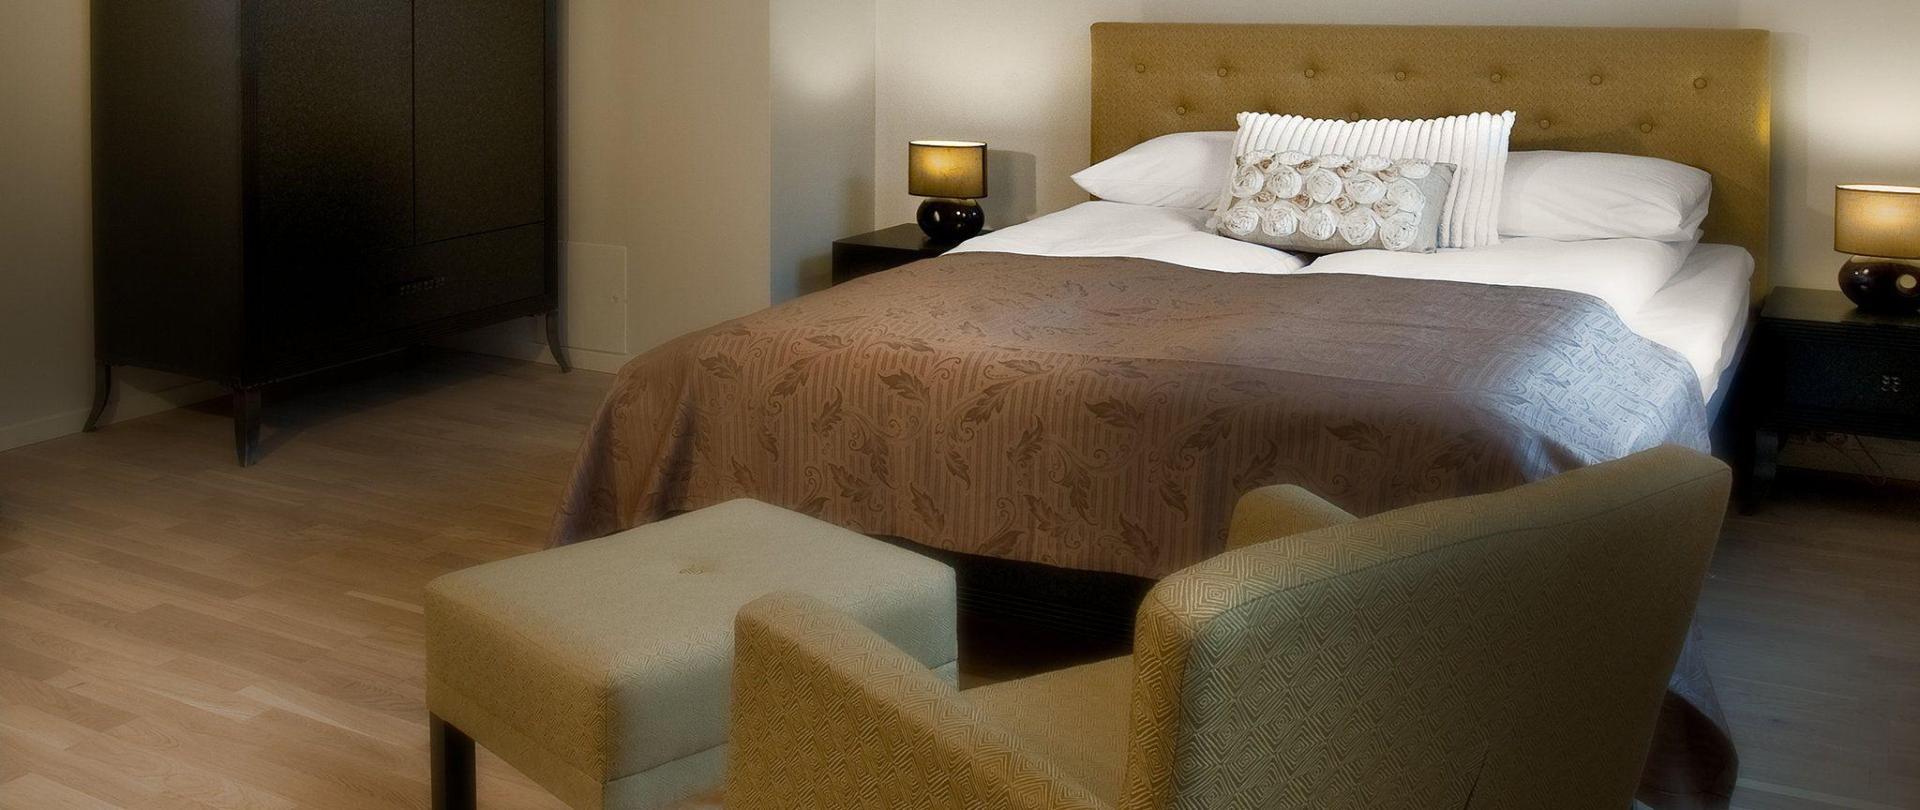 basic-hotel-bergen-011-2.jpg